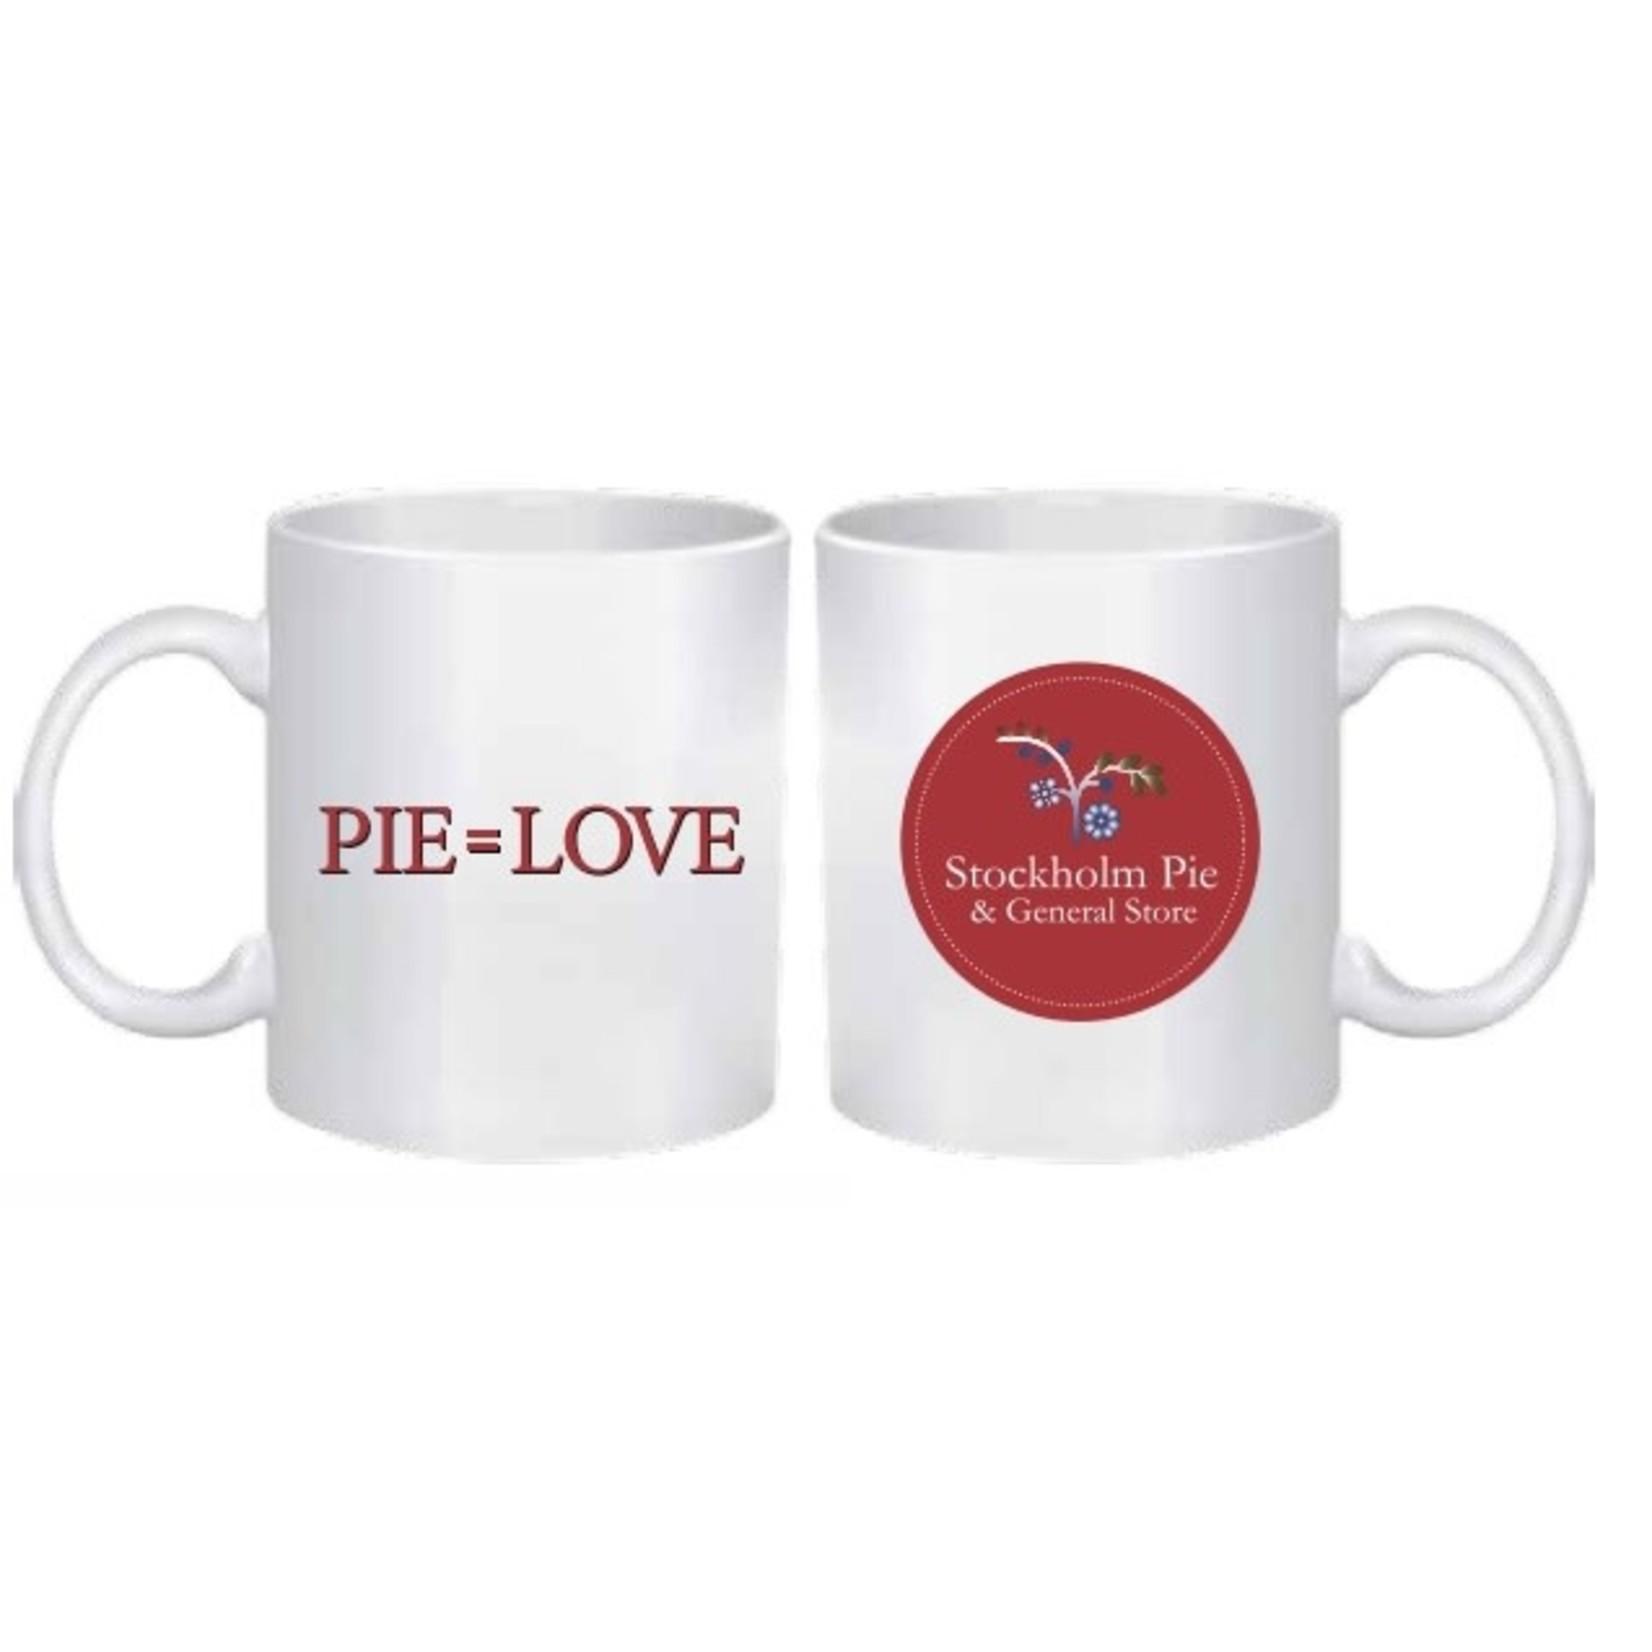 Private Label Stockholm & Pie Logo Mug